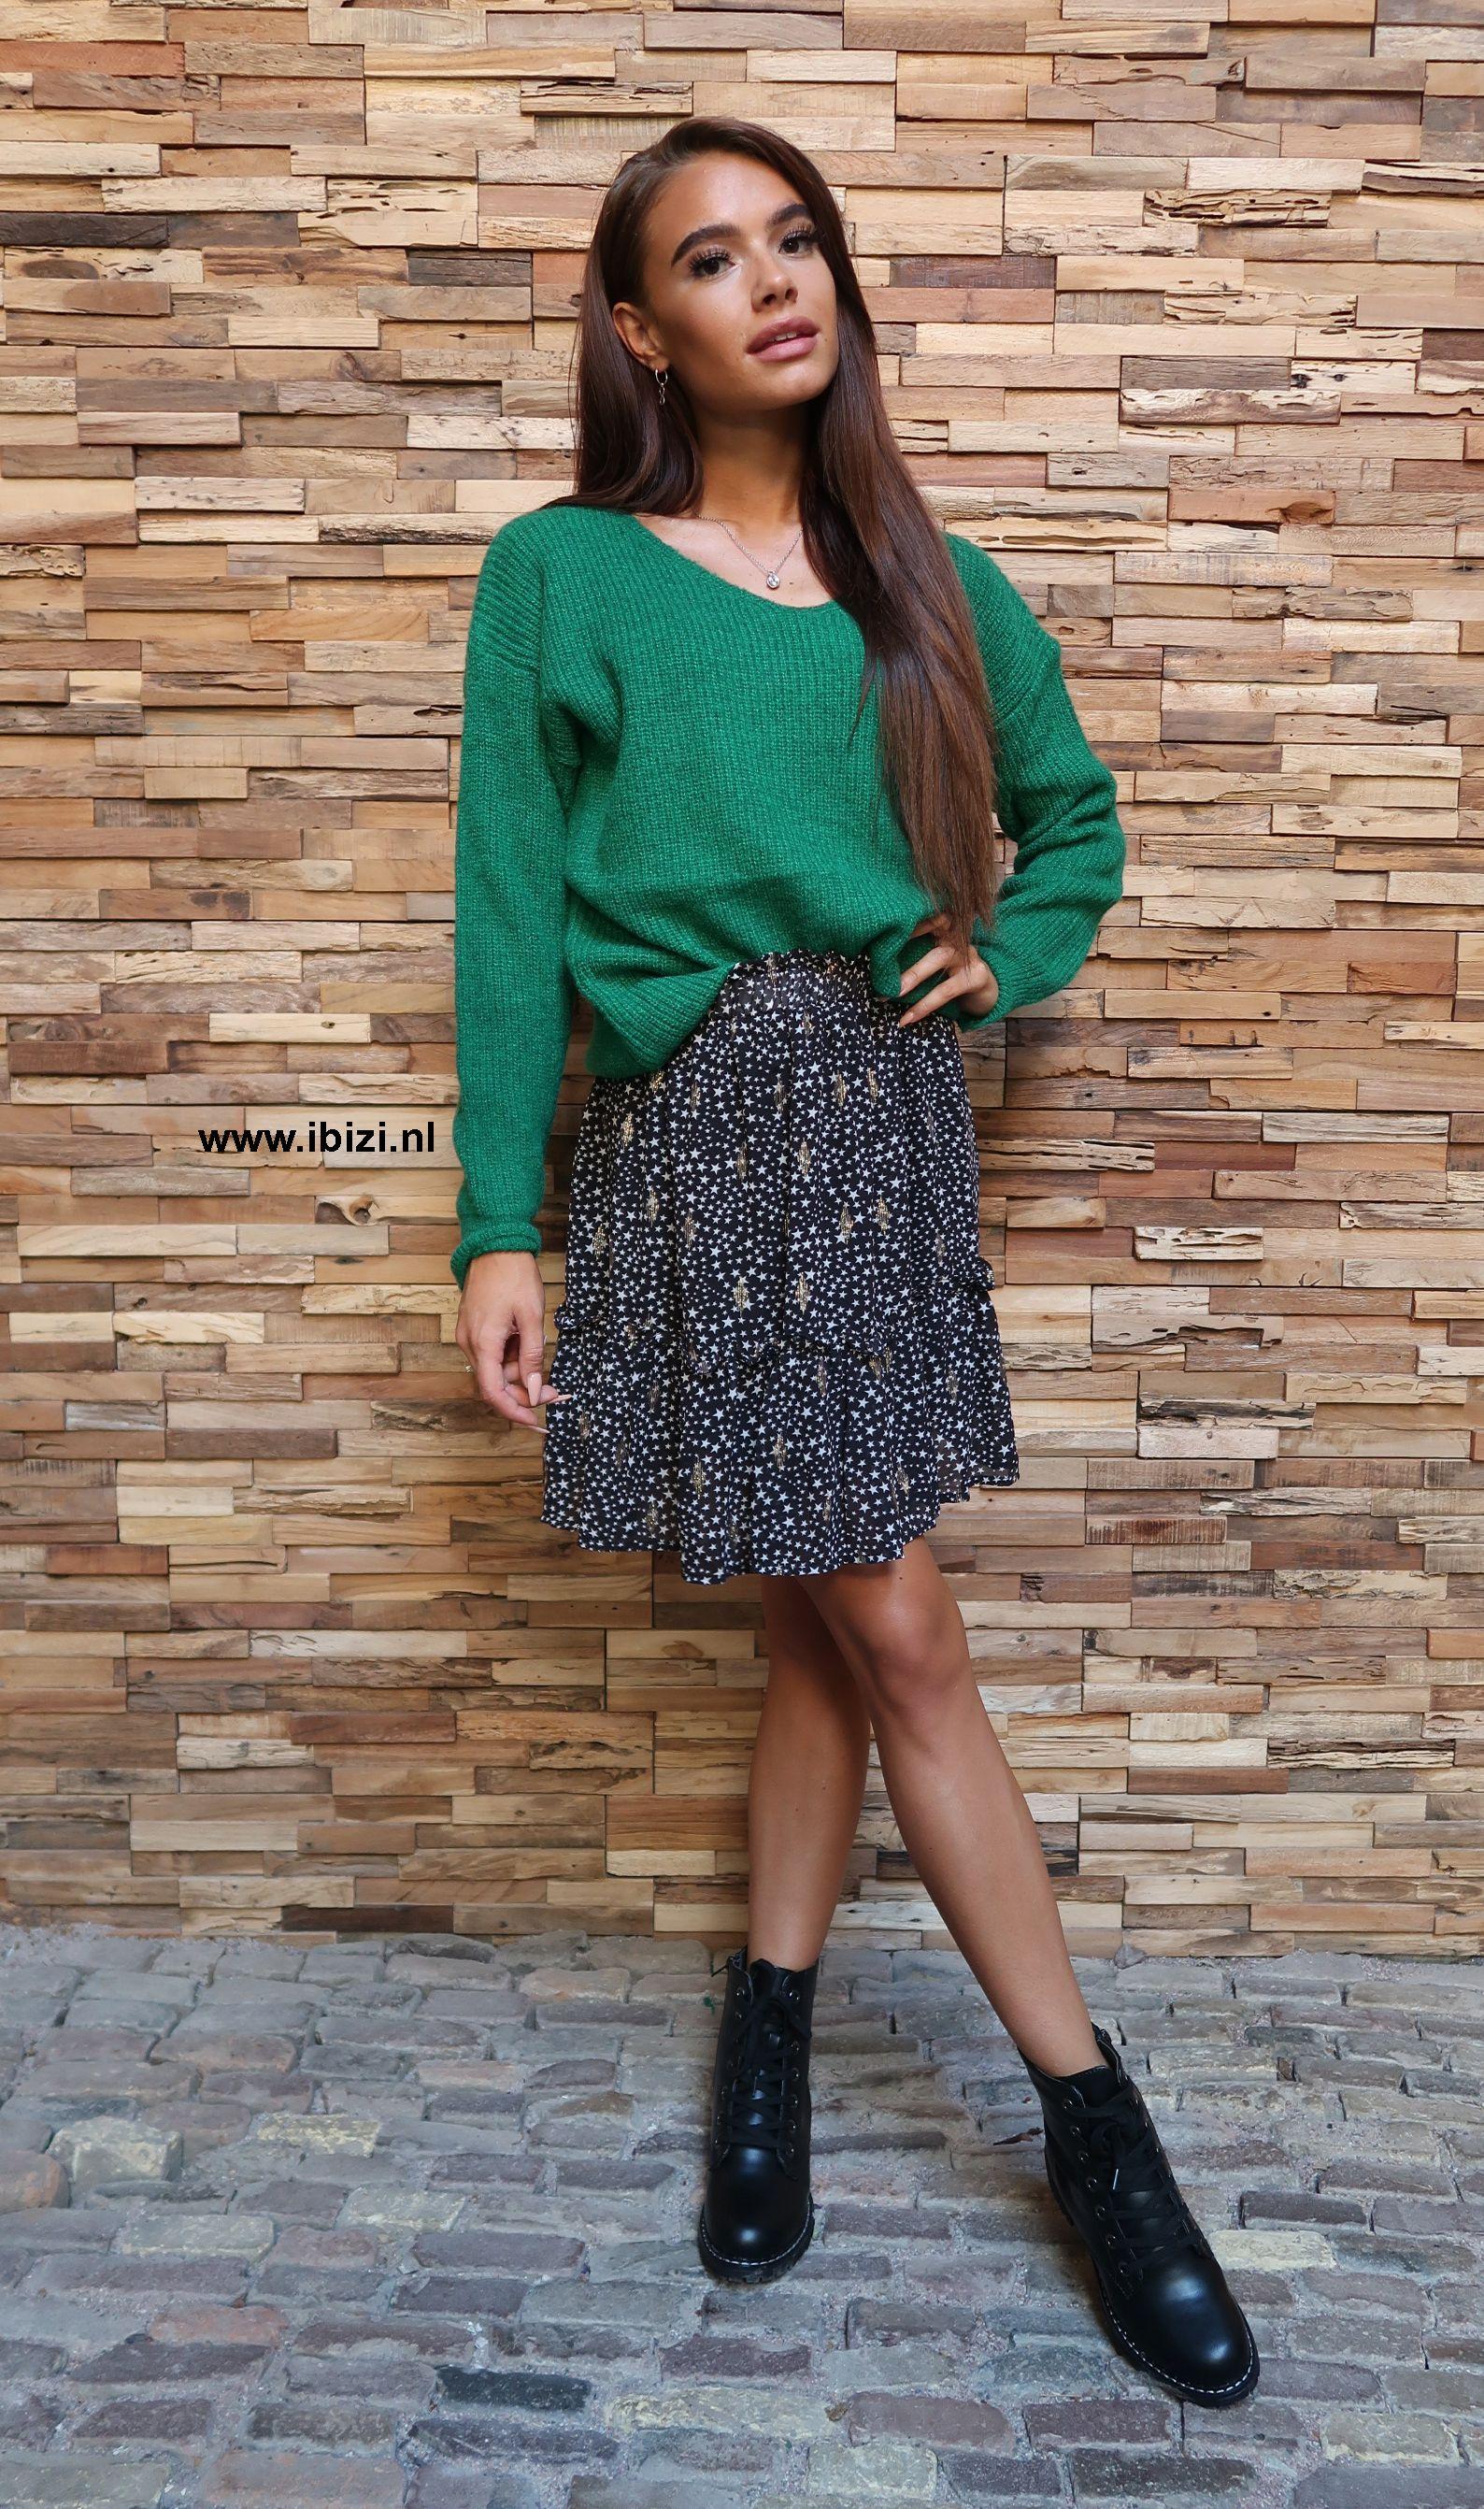 Trui over een jurkje dragen OUTFIT | Marloes Daily